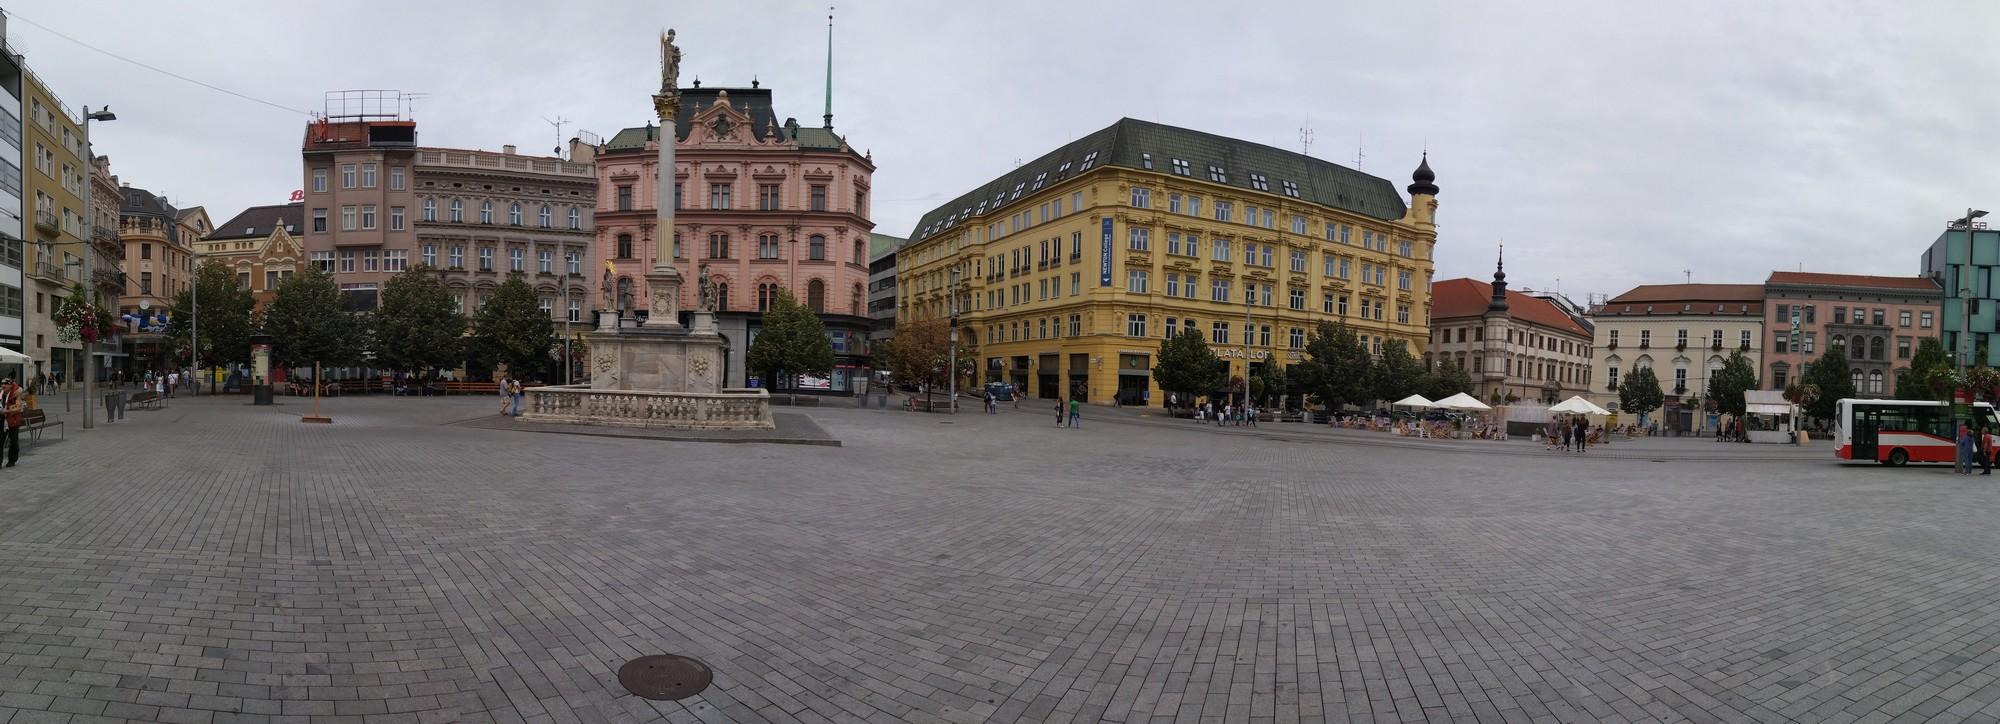 The Freedom square in Brno